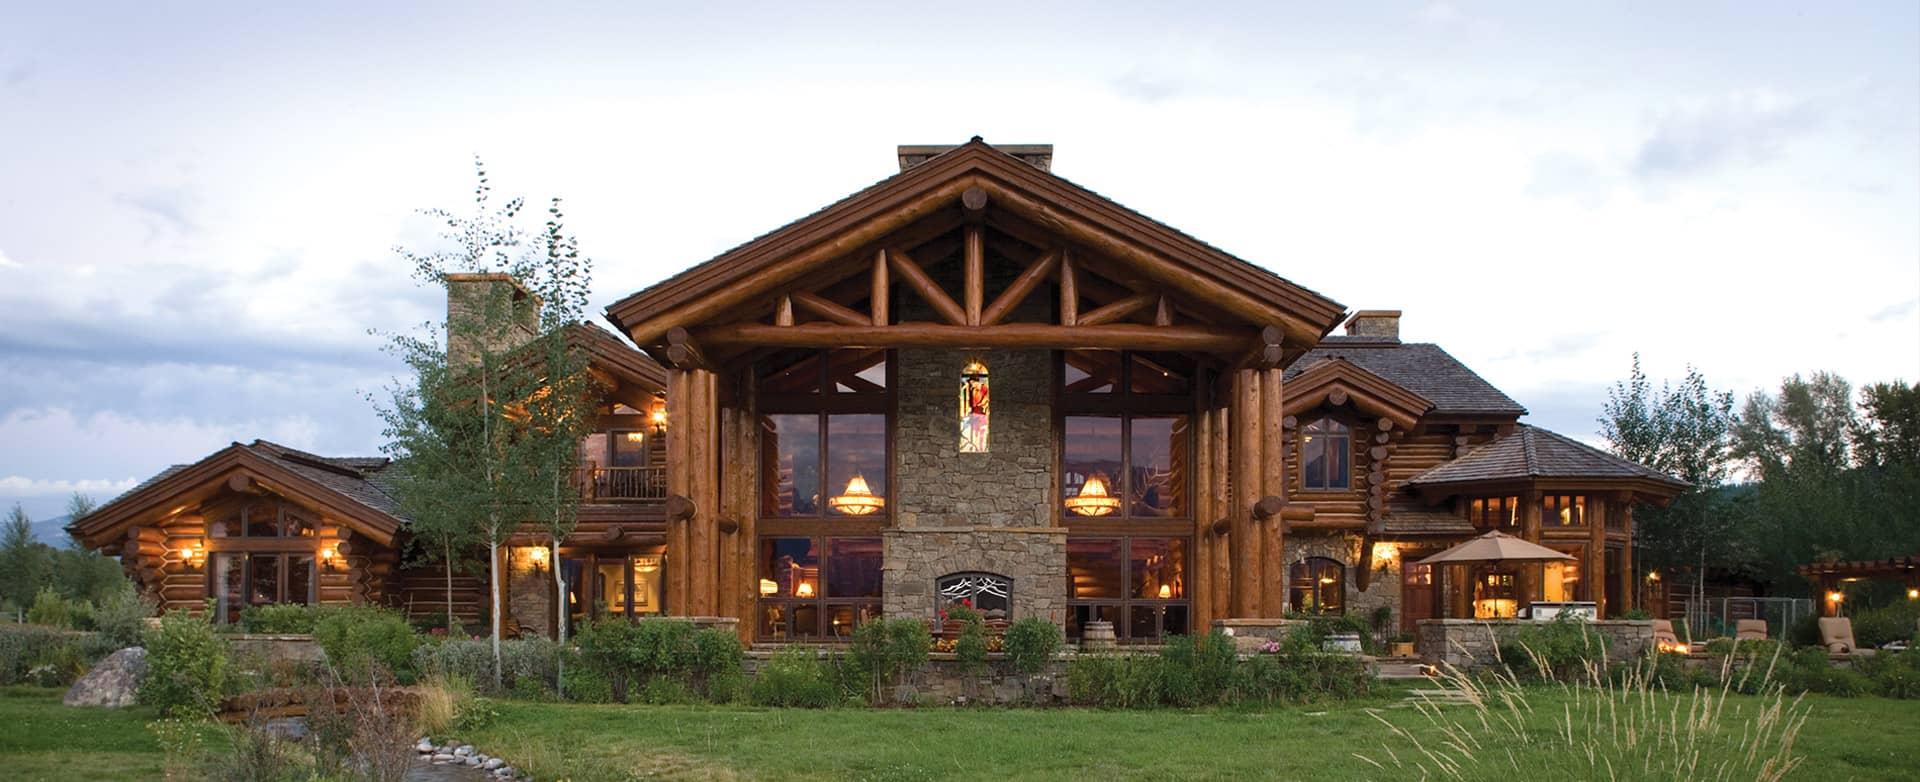 homes floor plans addition alpine log home plans large luxury lubbock large luxury homes